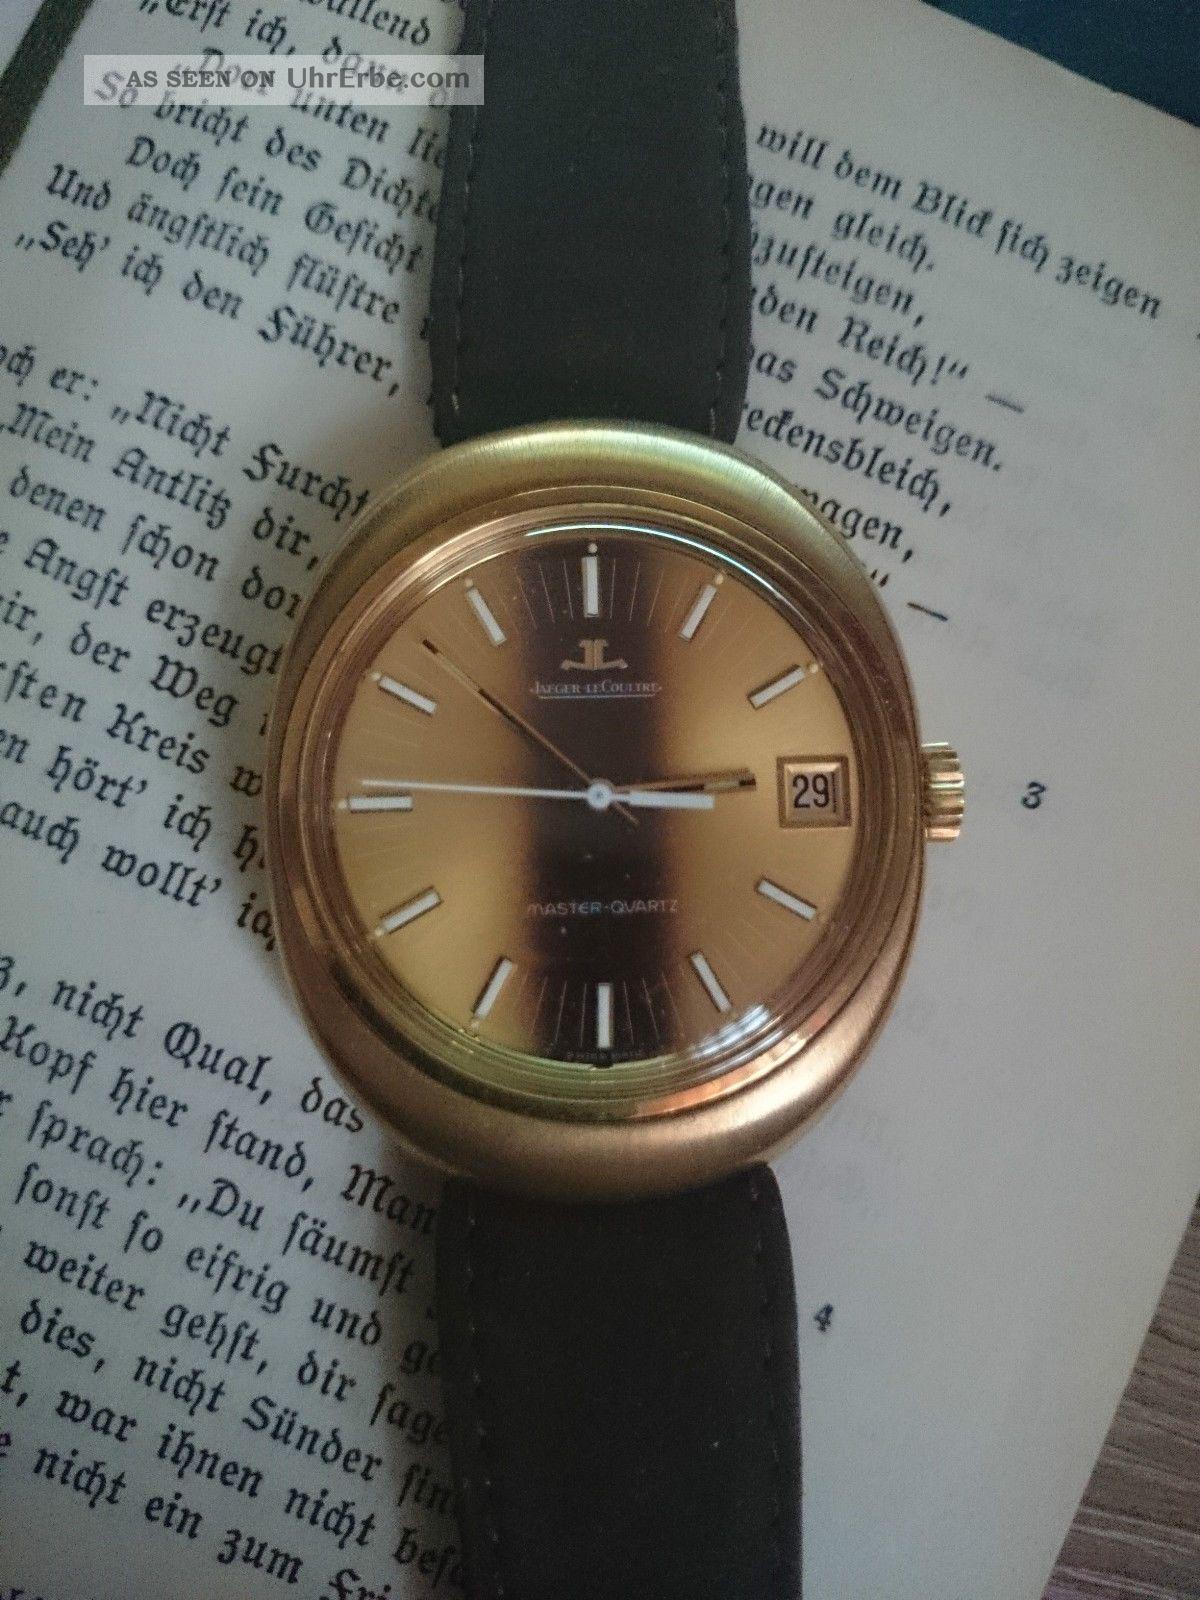 Jaeger Lecoultre Master - Quartz Armbanduhren Bild